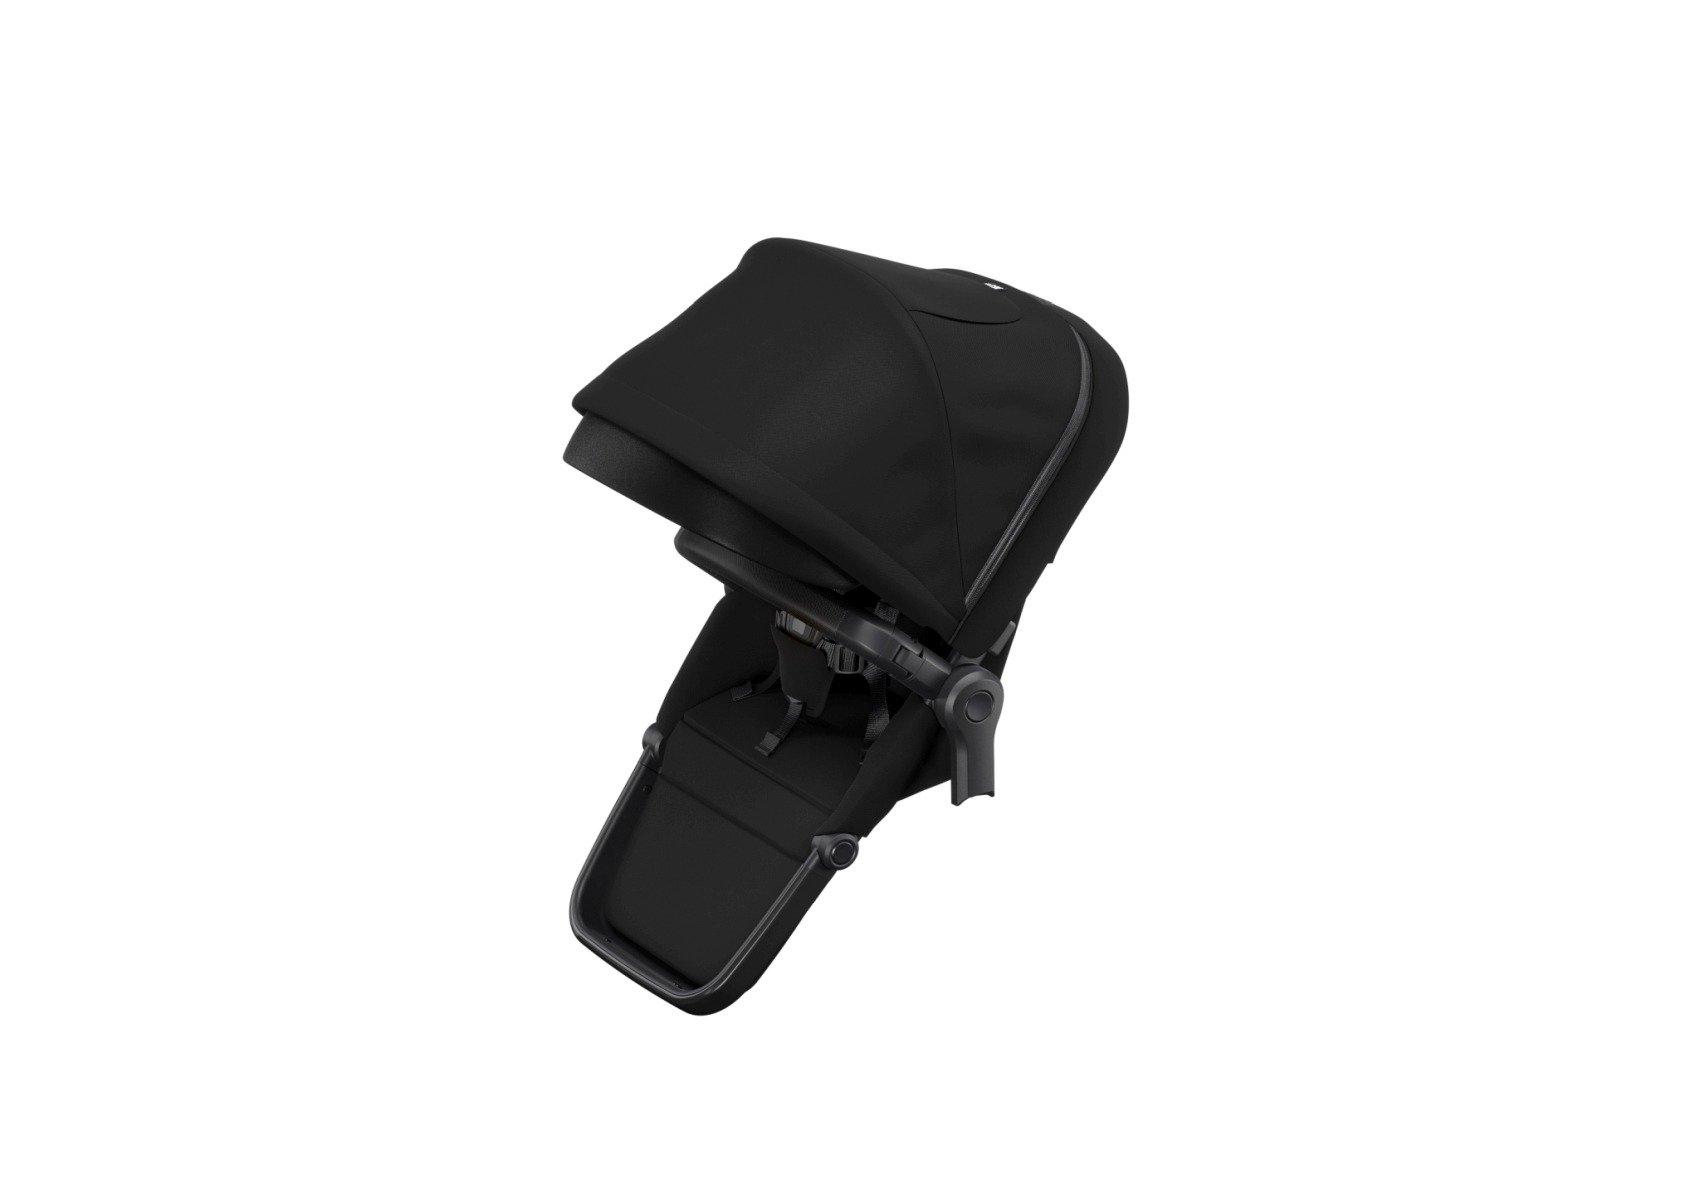 Thule Sleek - Black on Black - dodatkowe siedzisko